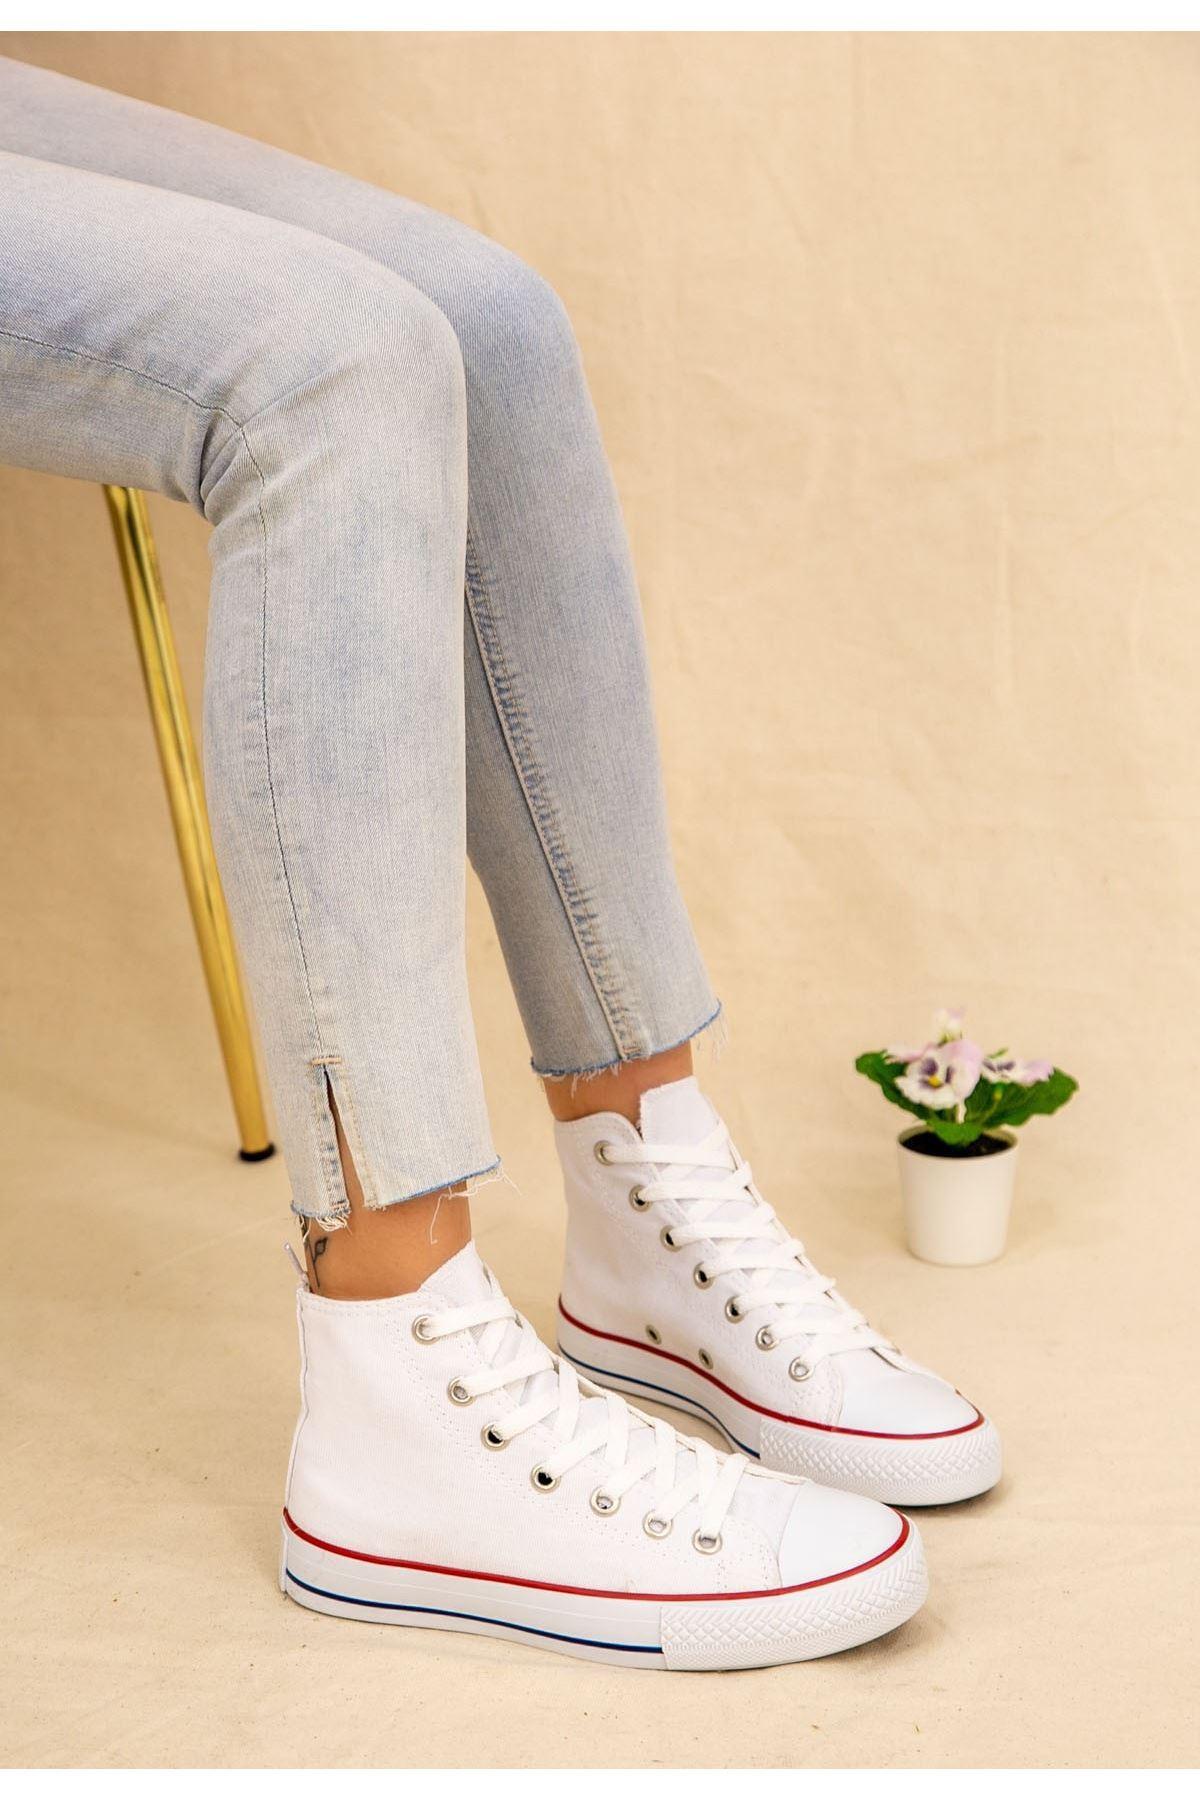 Kori Beyaz Keten Bot Spor Ayakkabı